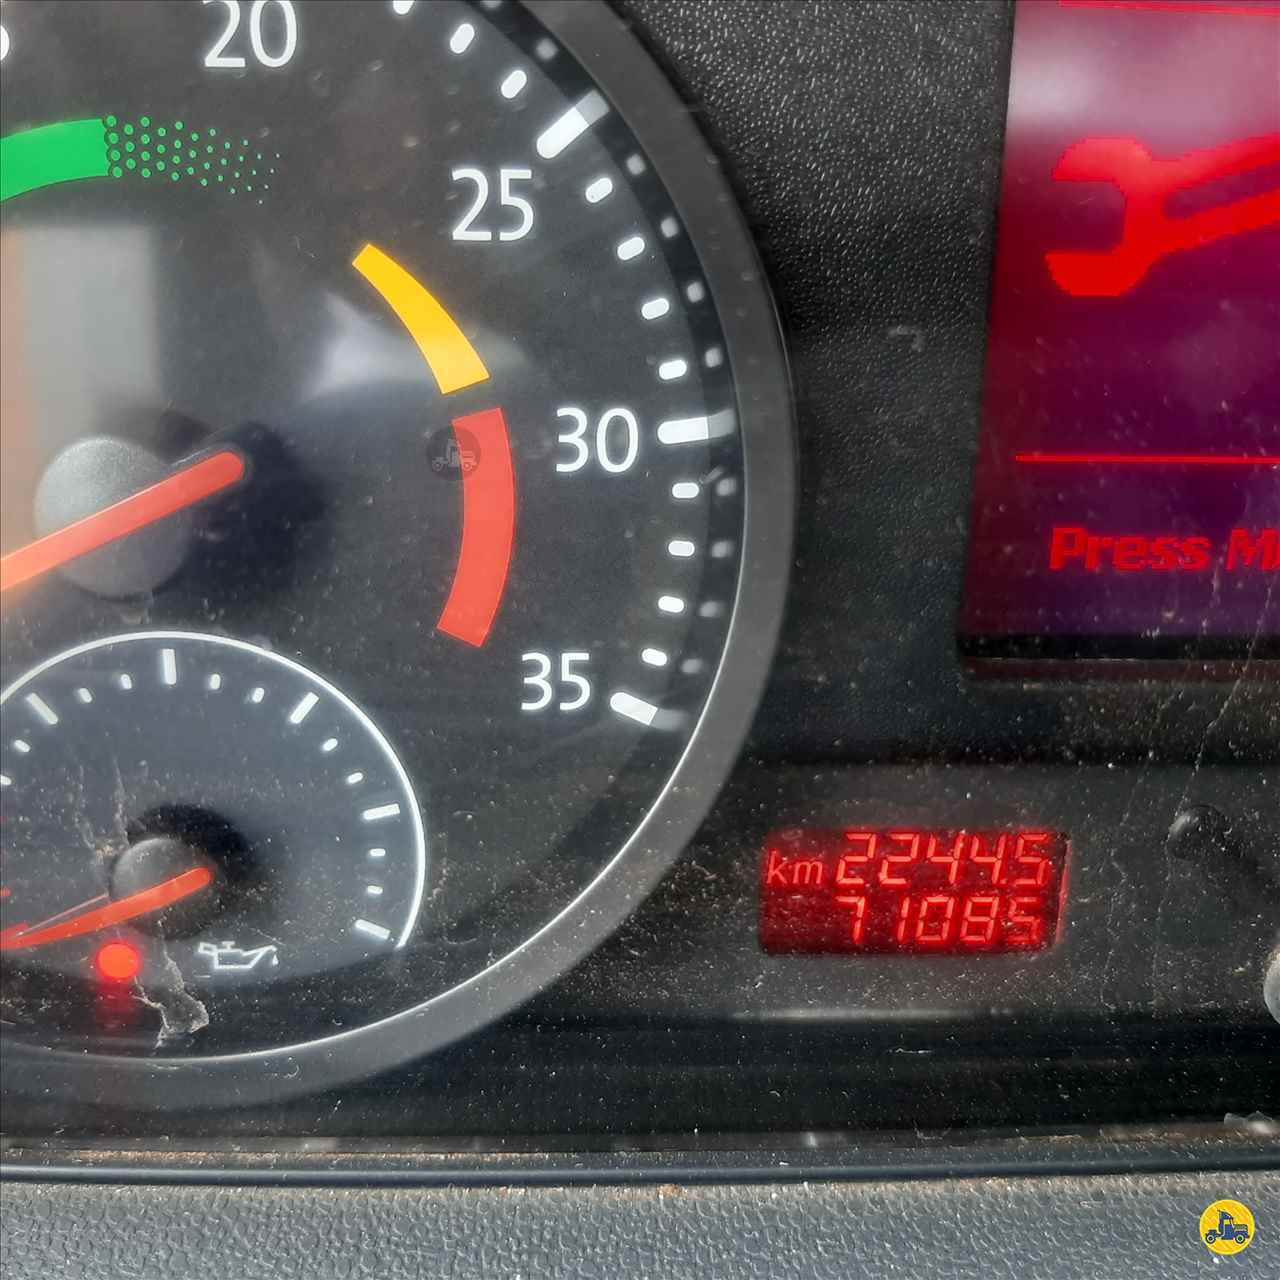 VOLKSWAGEN VW 8160 70000km 2016/2017 Megatruck Caminhões e Máquinas